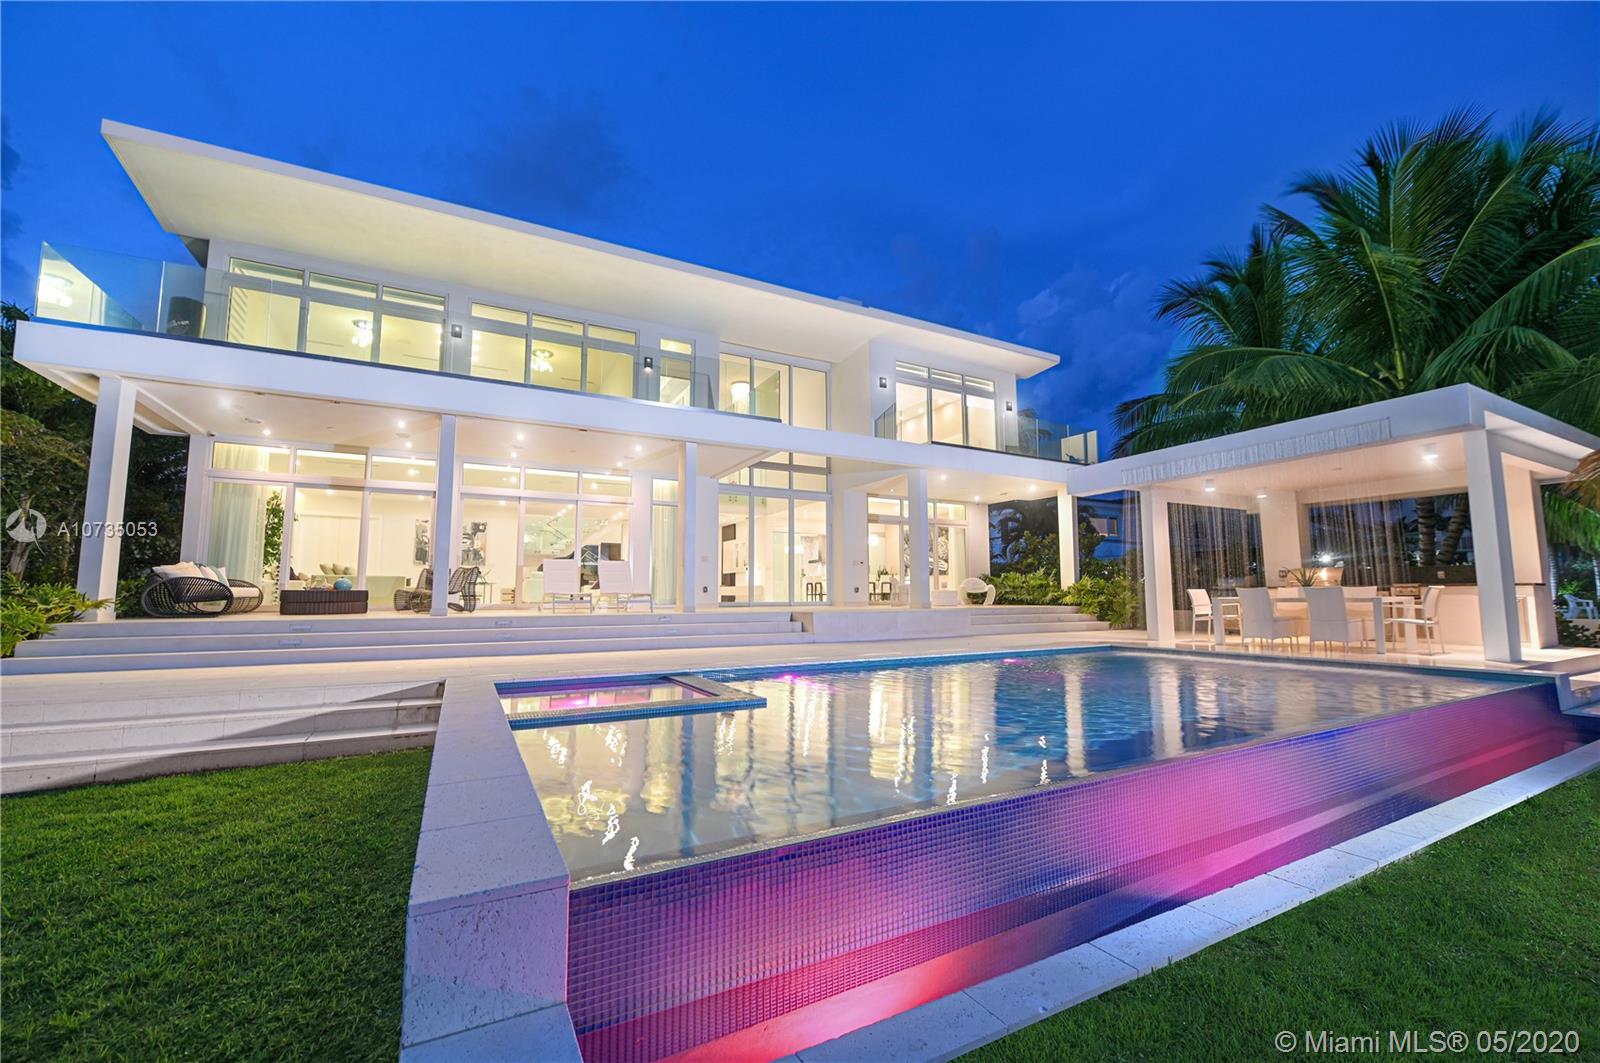 Miami & Miami Beach Waterfront Homes for Sale & Rent